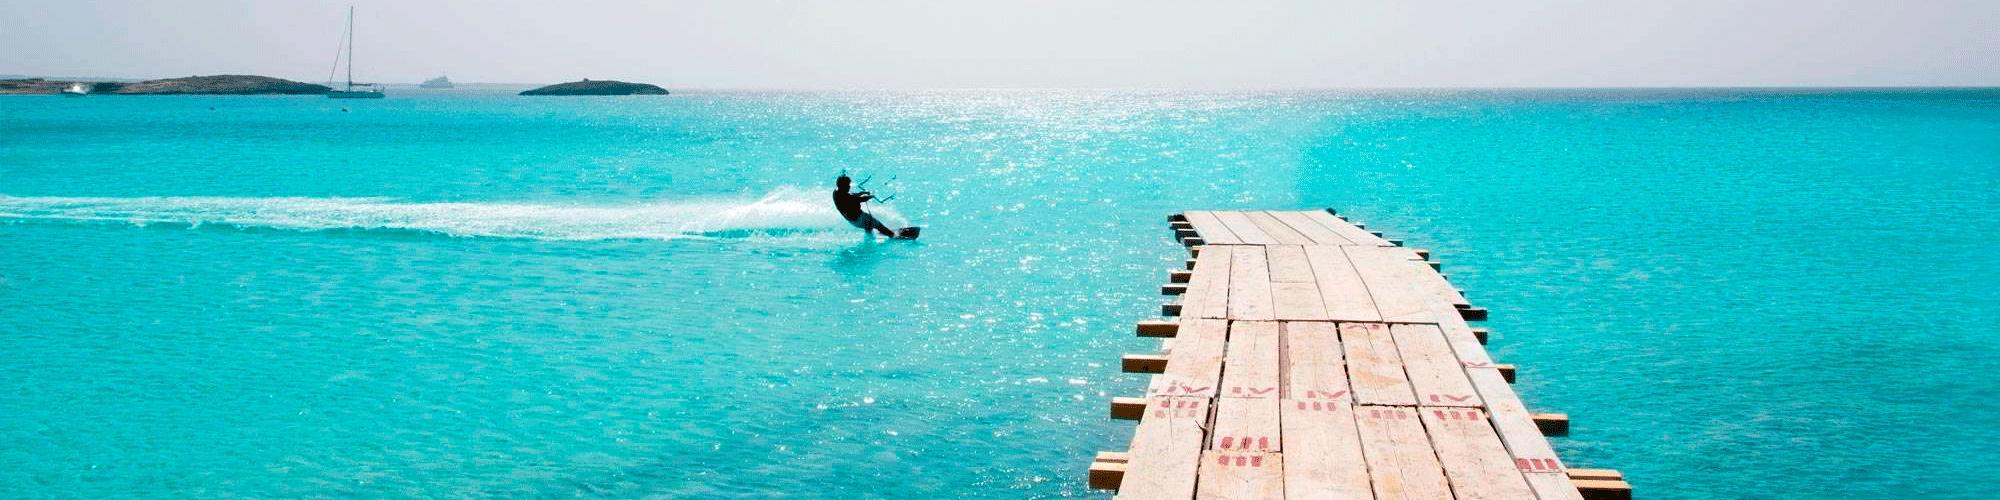 Comprar casa en Formentera, Islas Baleares